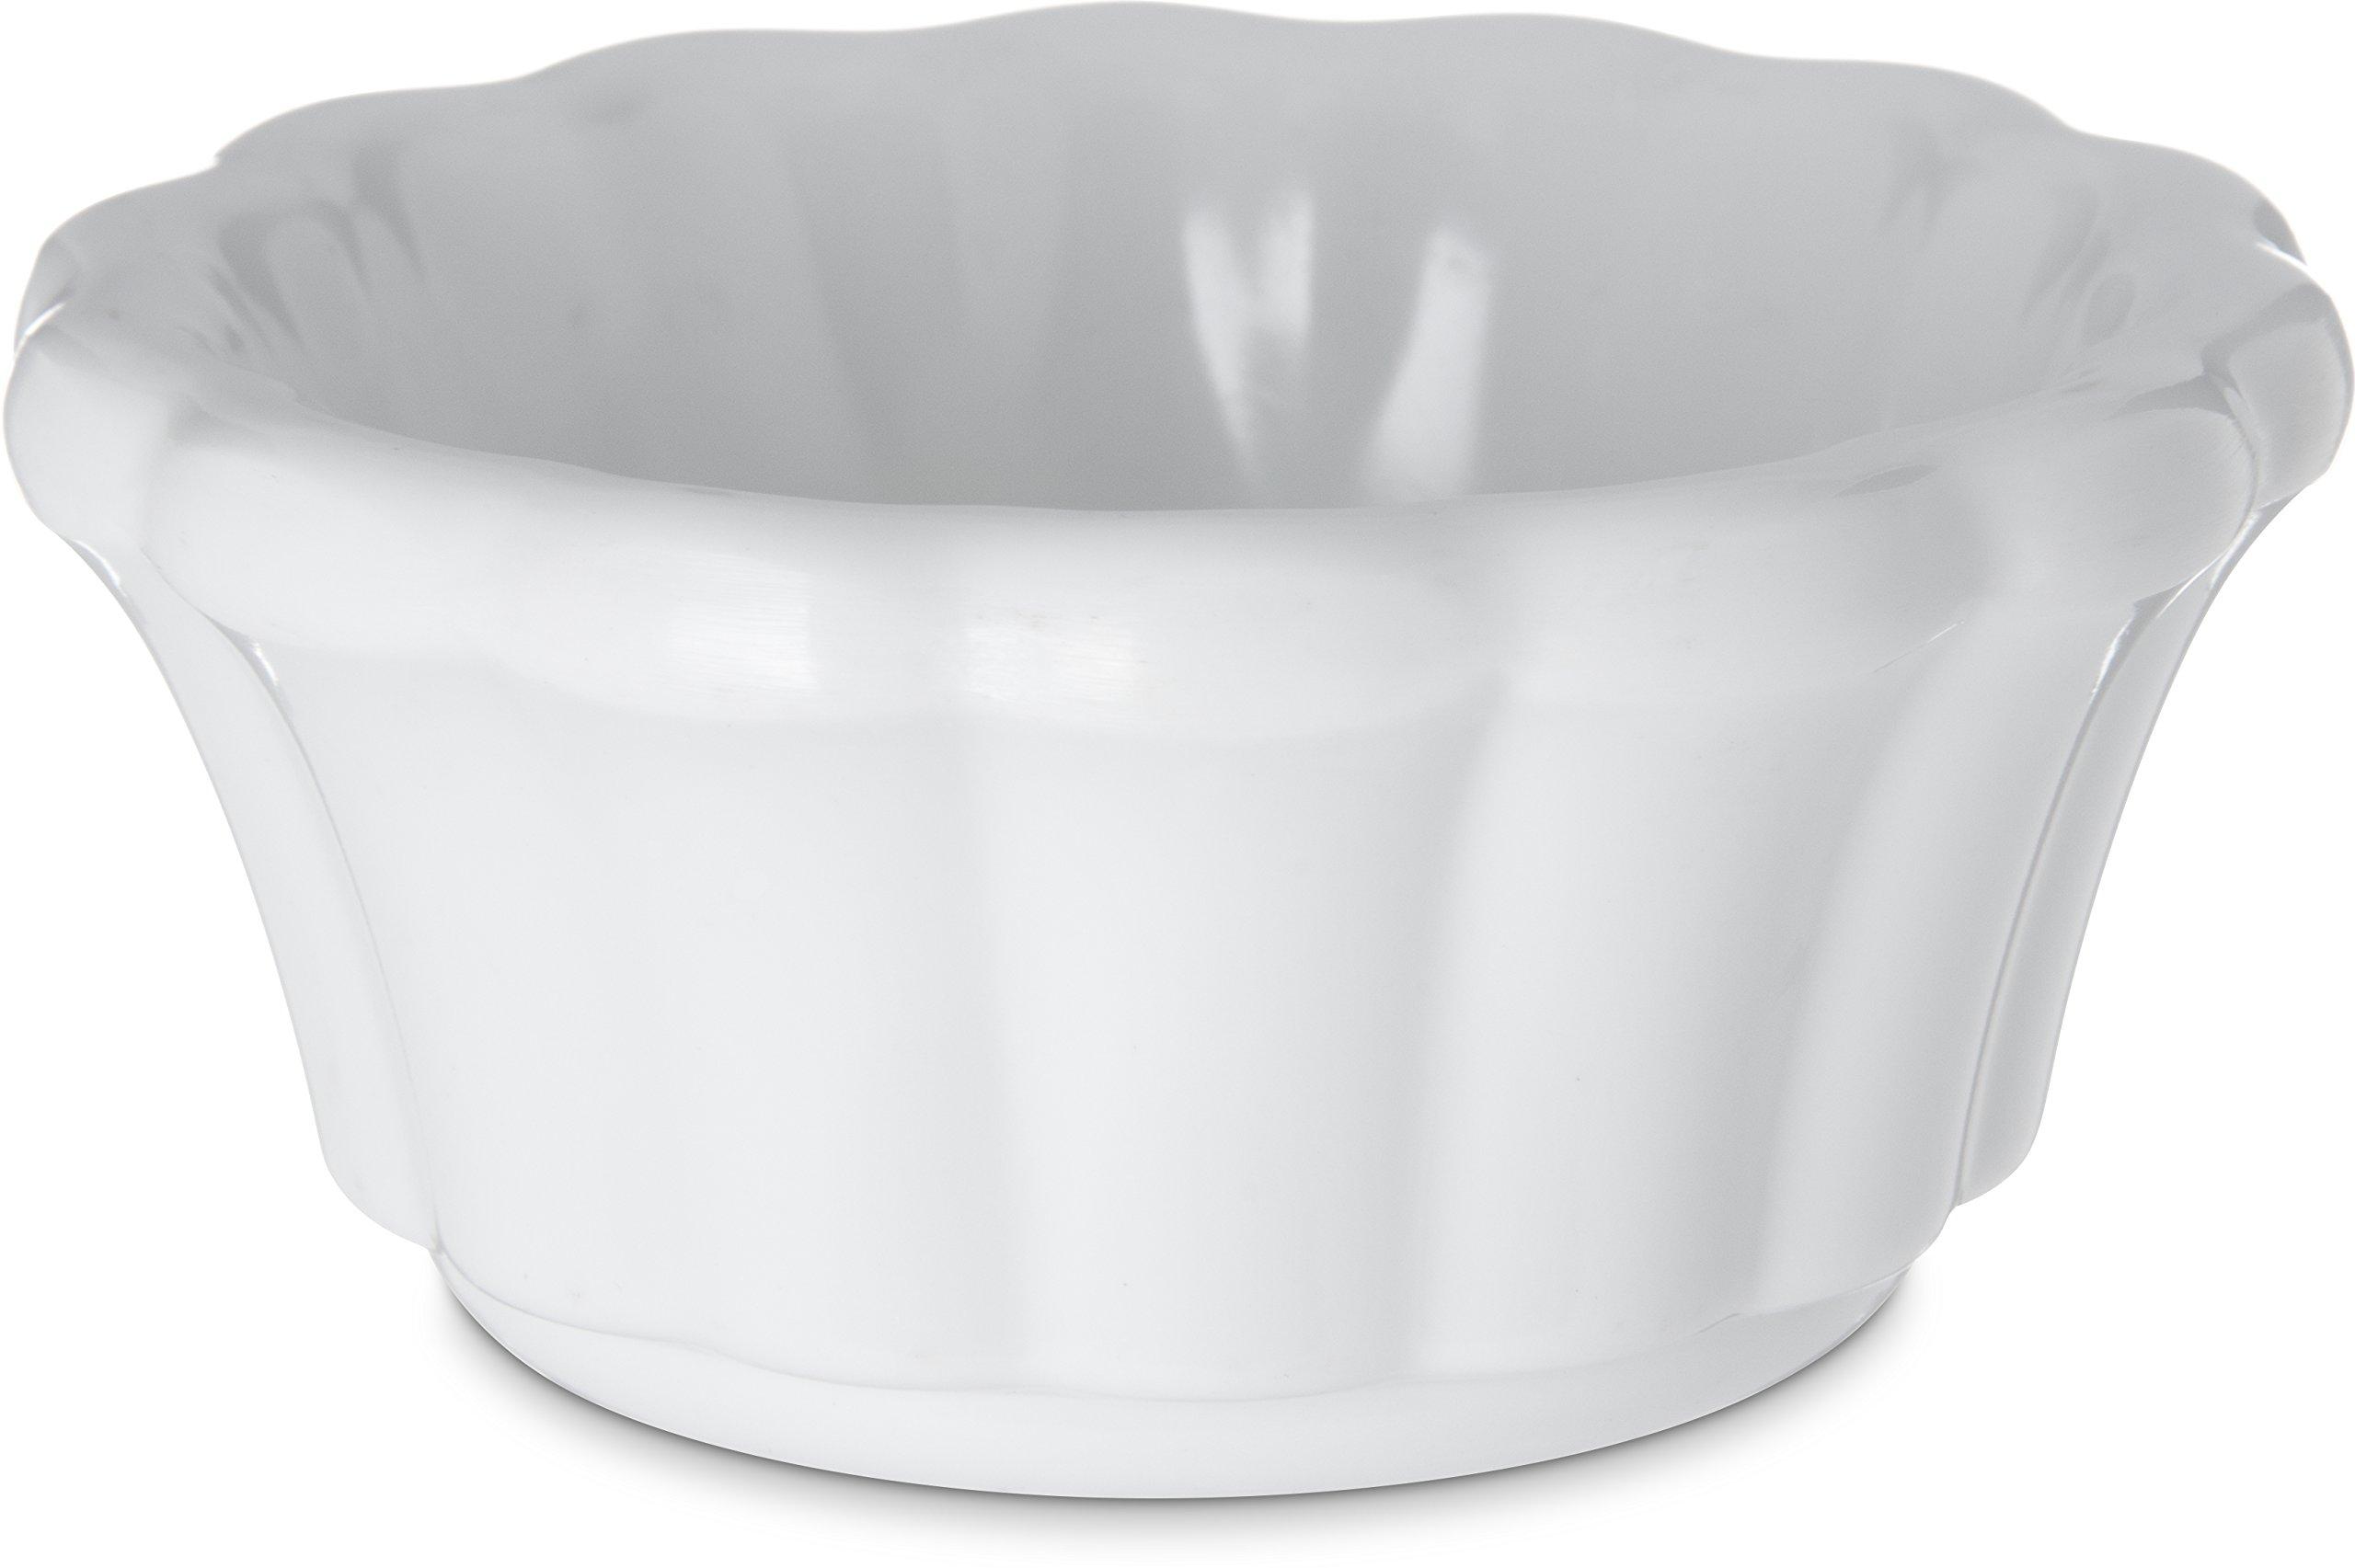 White 3 ounce Scalloped Ramekin - 48 per case